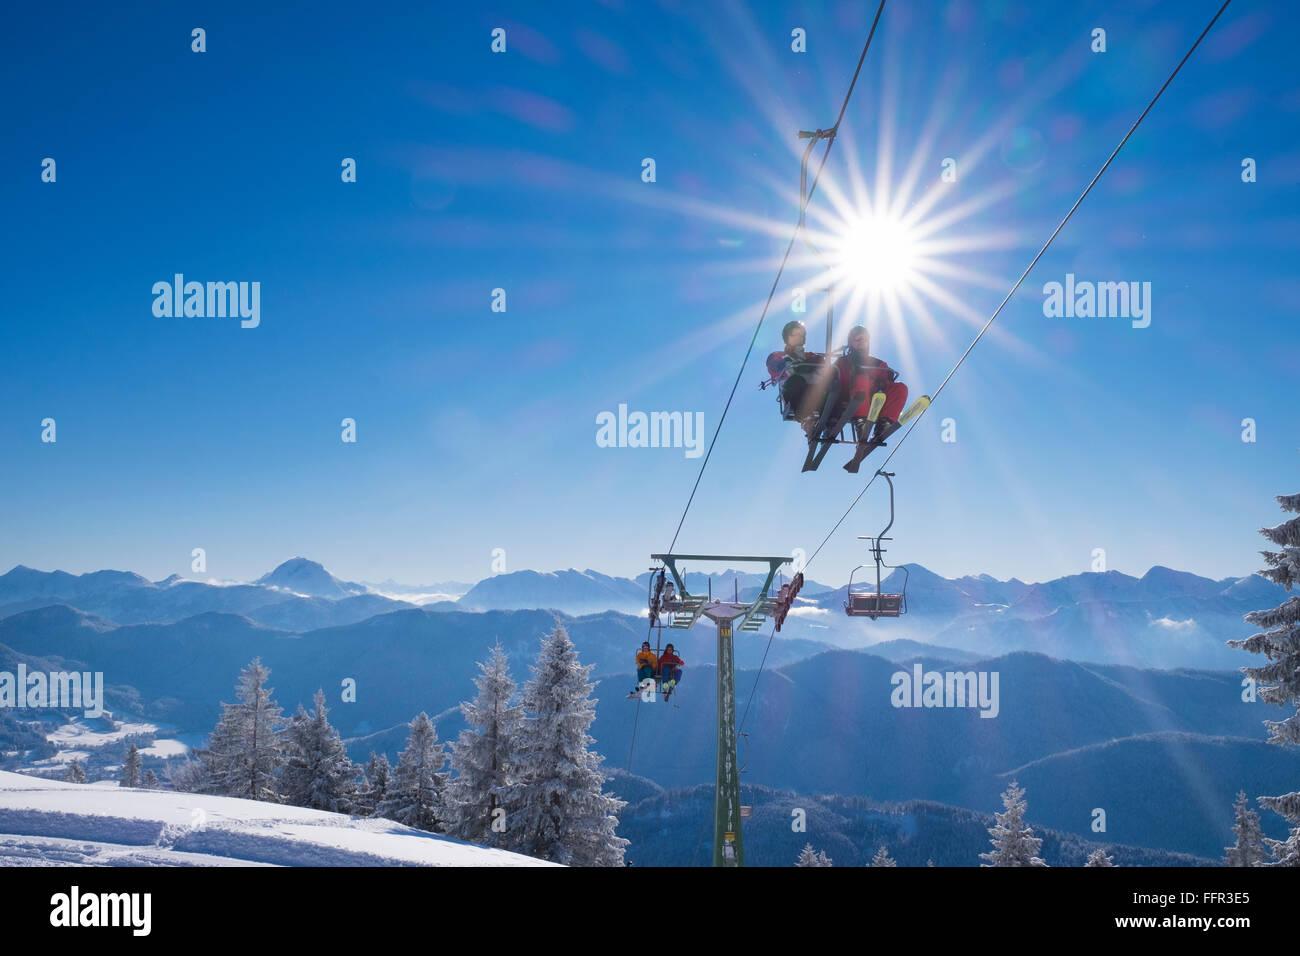 Finstermünz chairlift, ski resort Brauneck, Lenggries, Isarwinkel, Bavarian Prealps, Upper Bavaria, Bavaria, - Stock Image